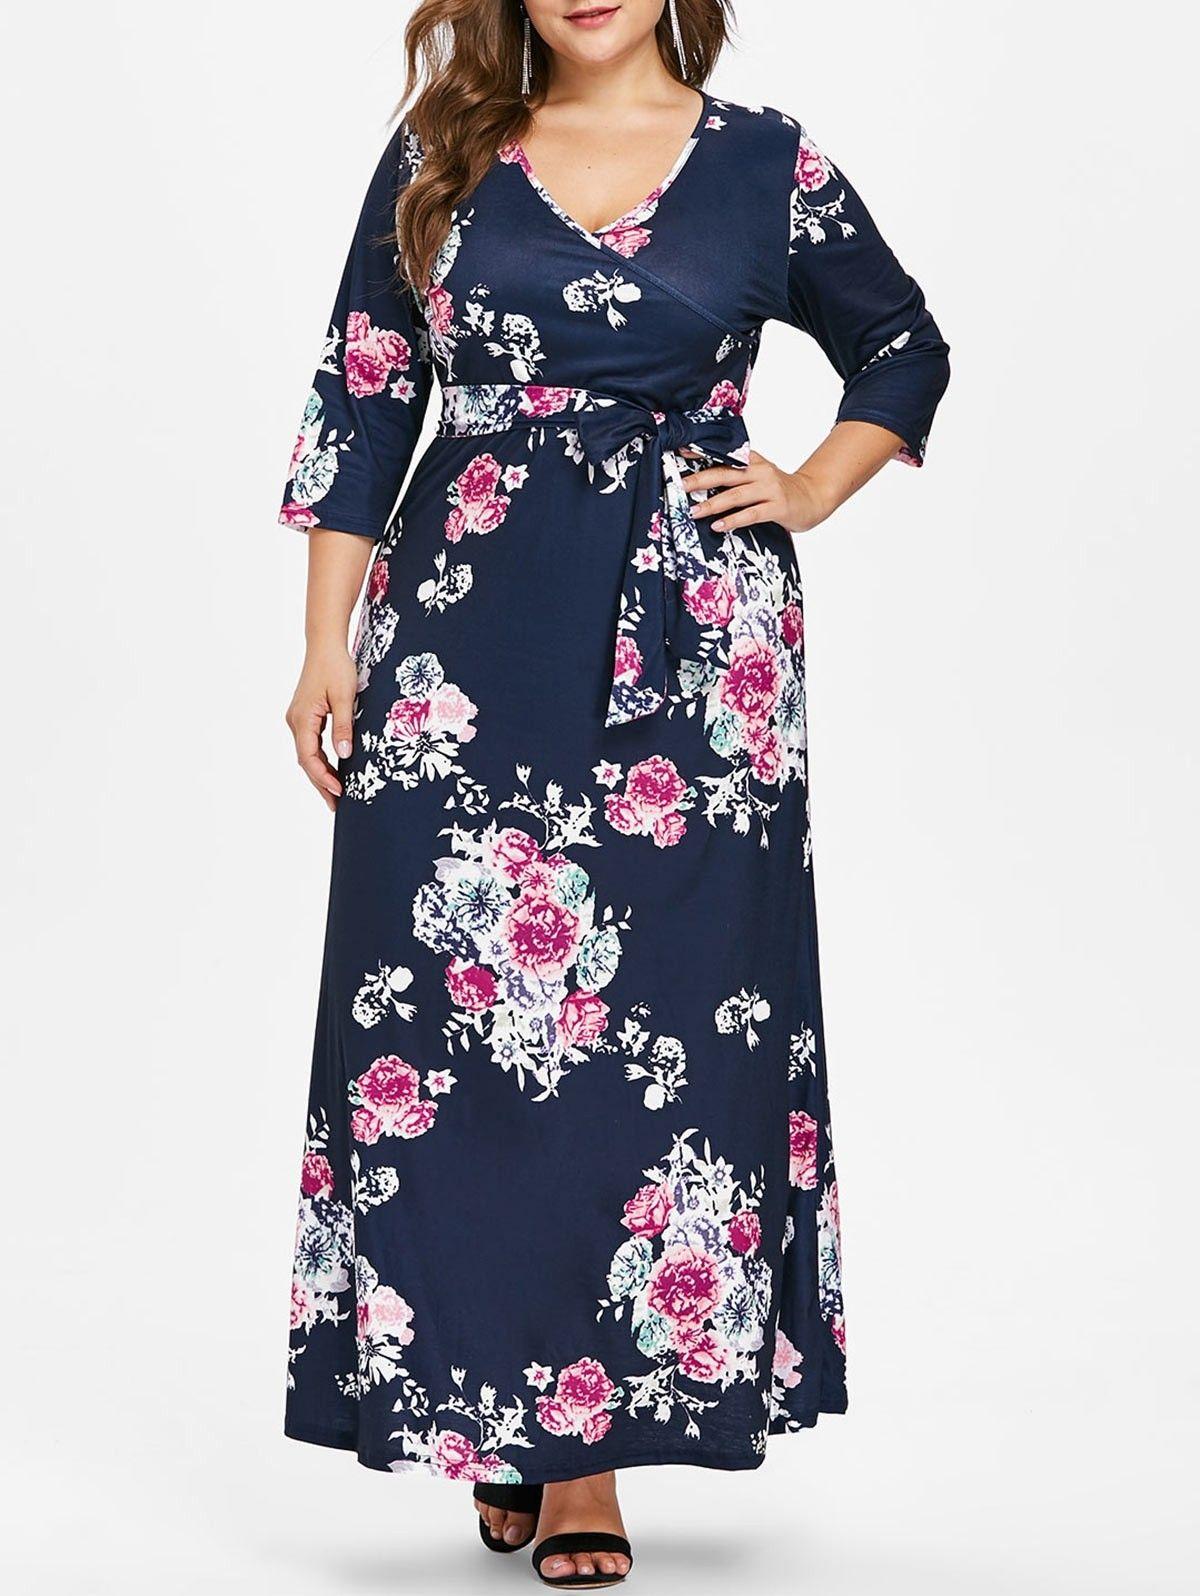 Plus Size Flower Print Floor Length Dress Cadetblue 3288830619 Size L Dresses Floor Length Dresses Designer Outfits Woman